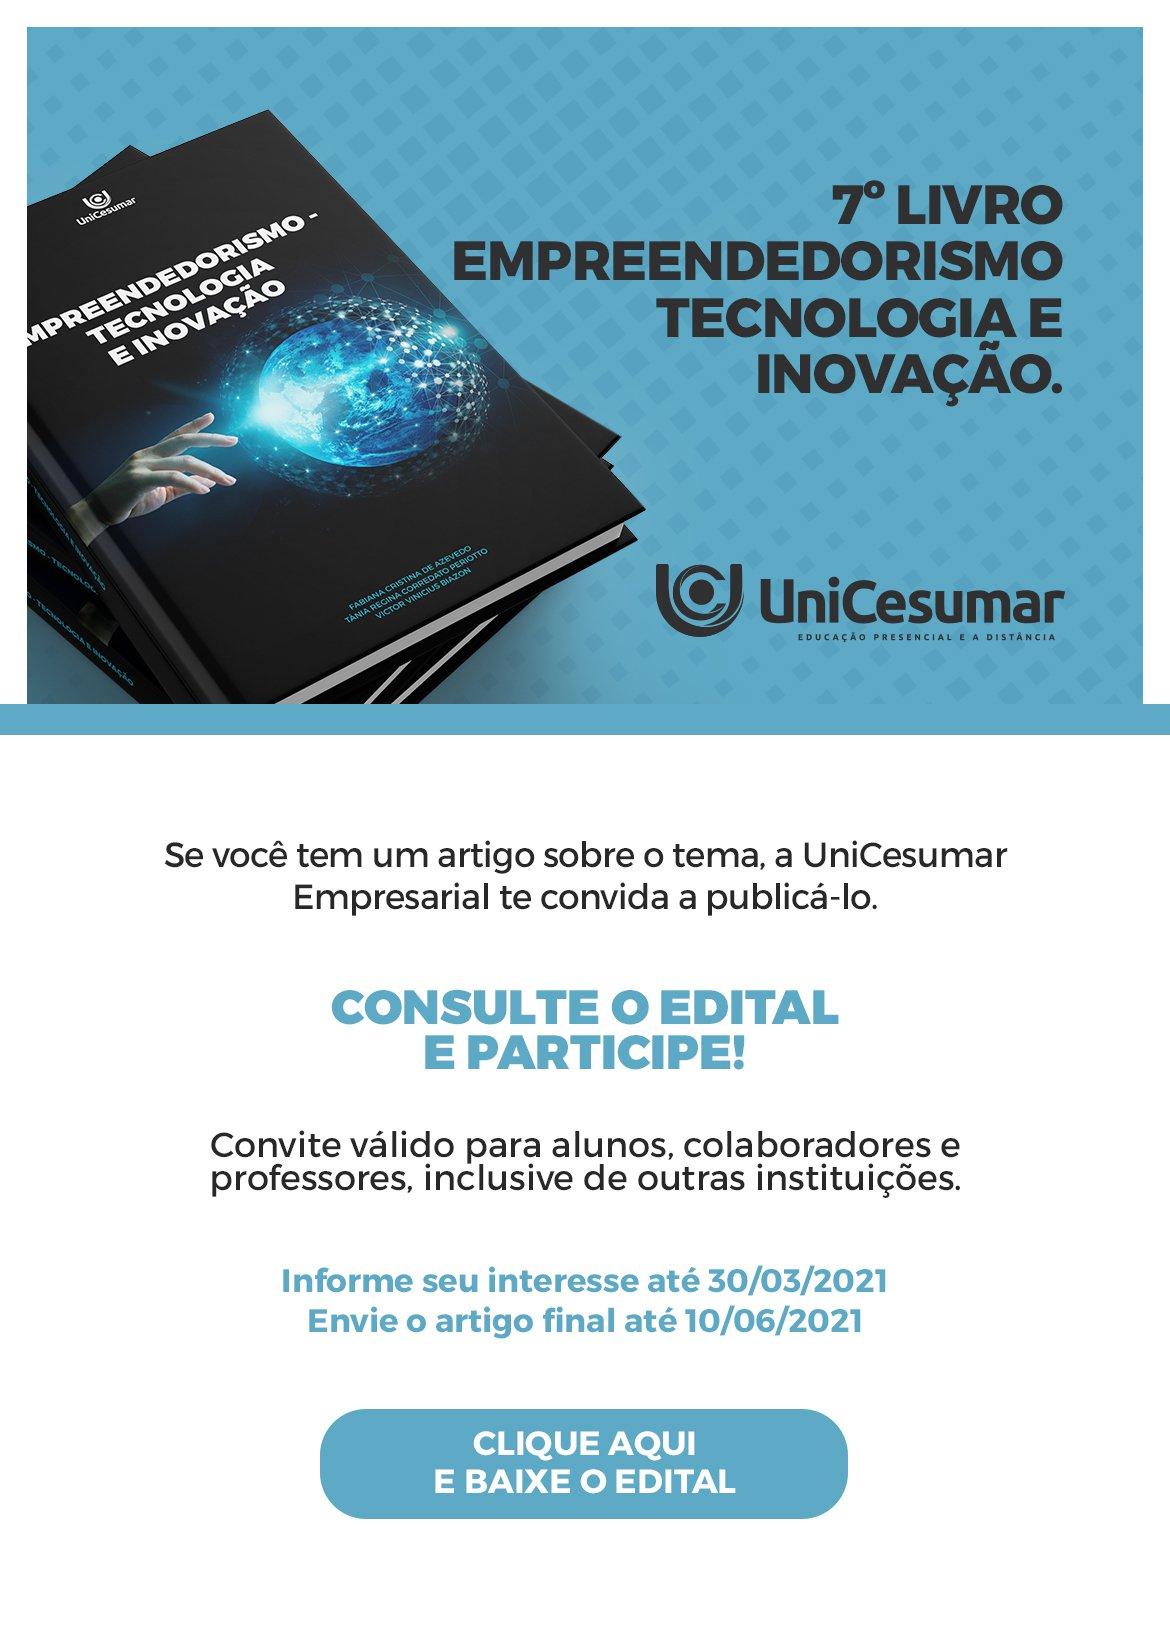 4569_hotsite_livro_empreendedorismo_2021